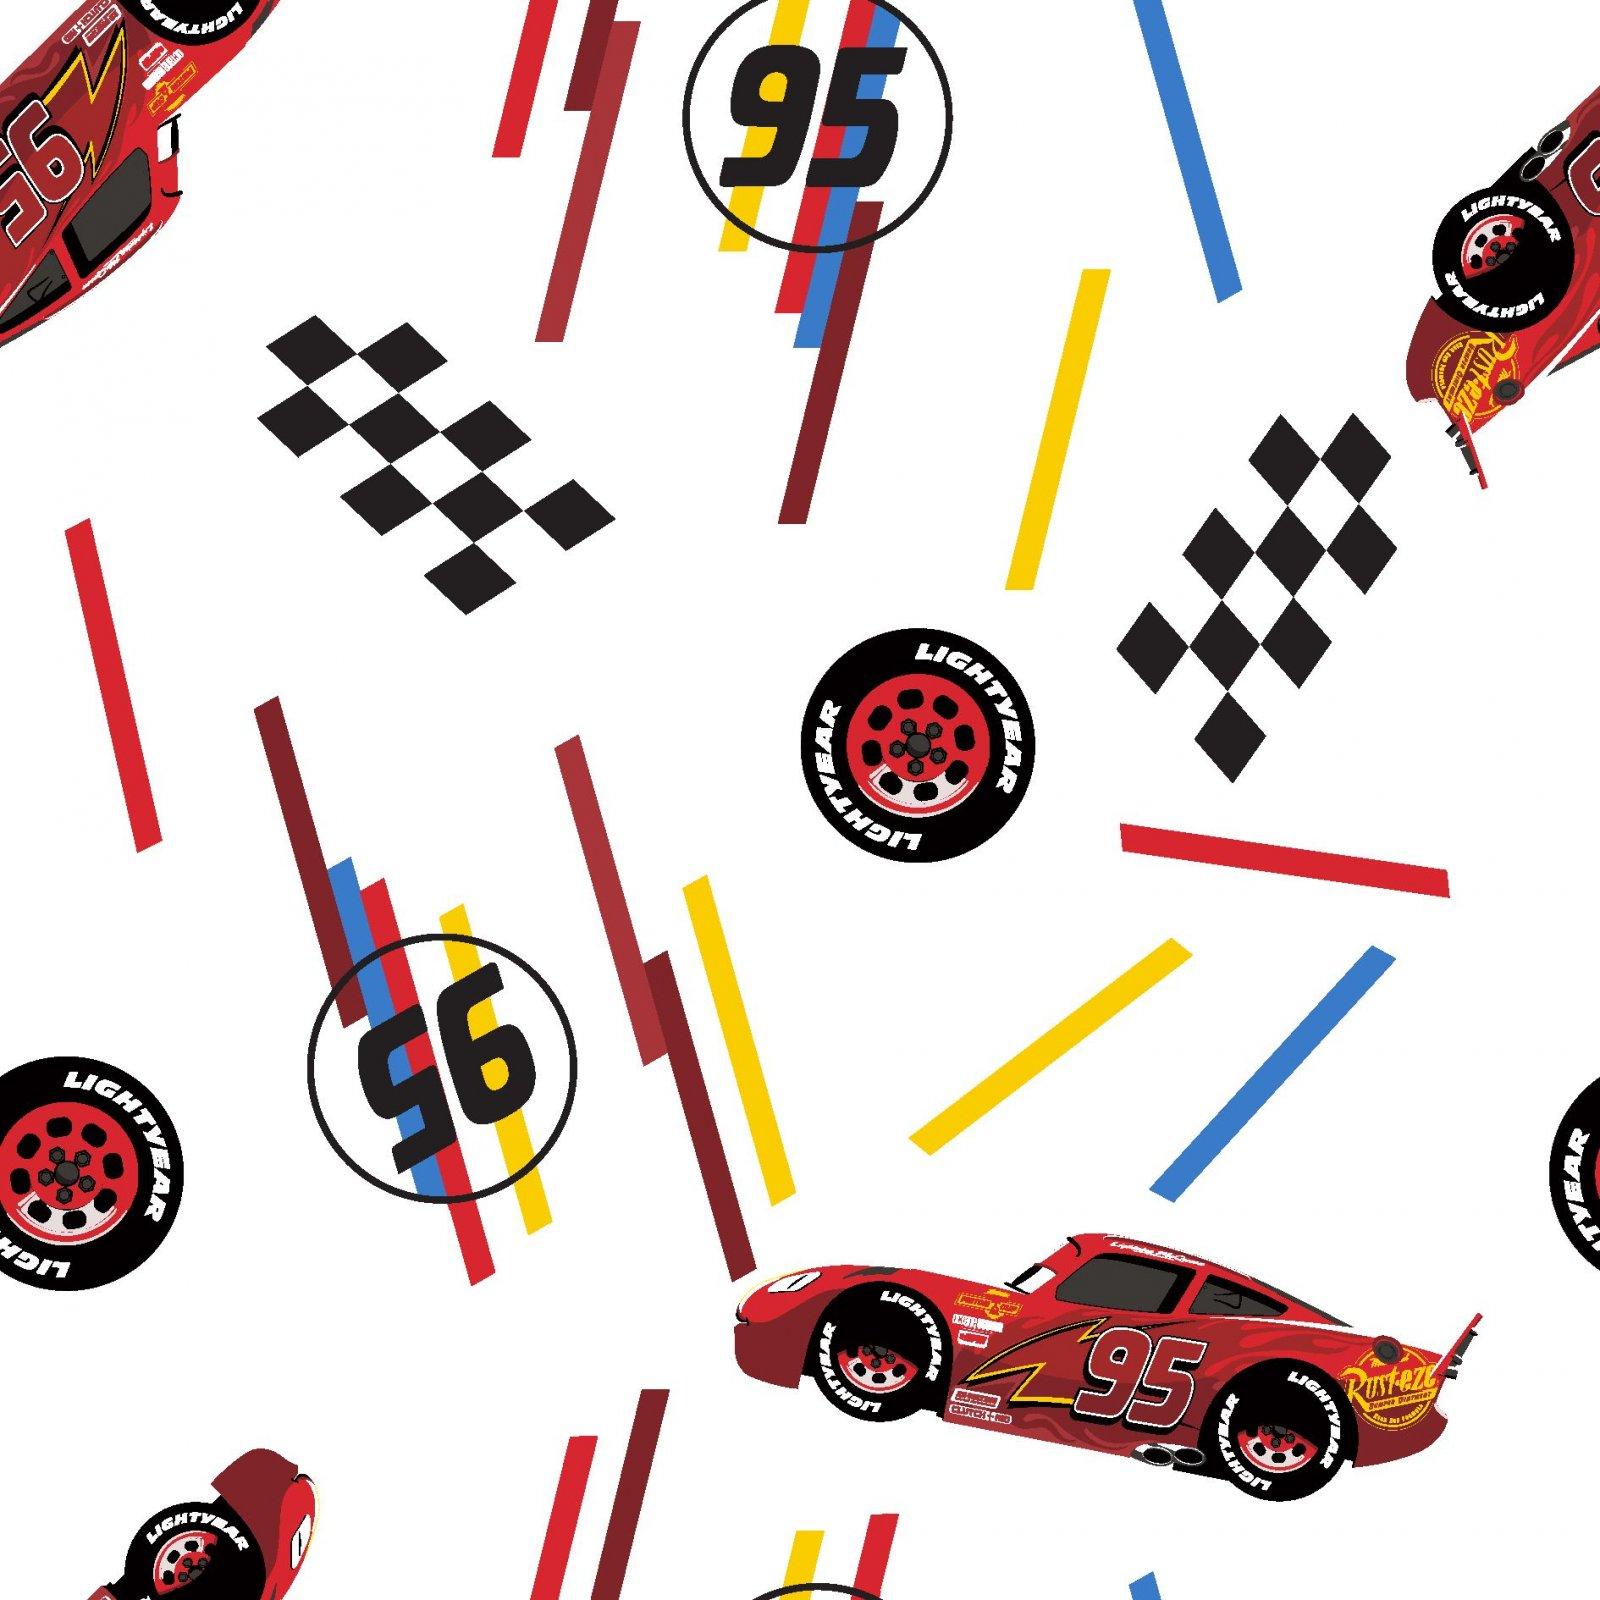 SC-Disney Pixar Cars 76824-A620715 McQueen Tires Toss